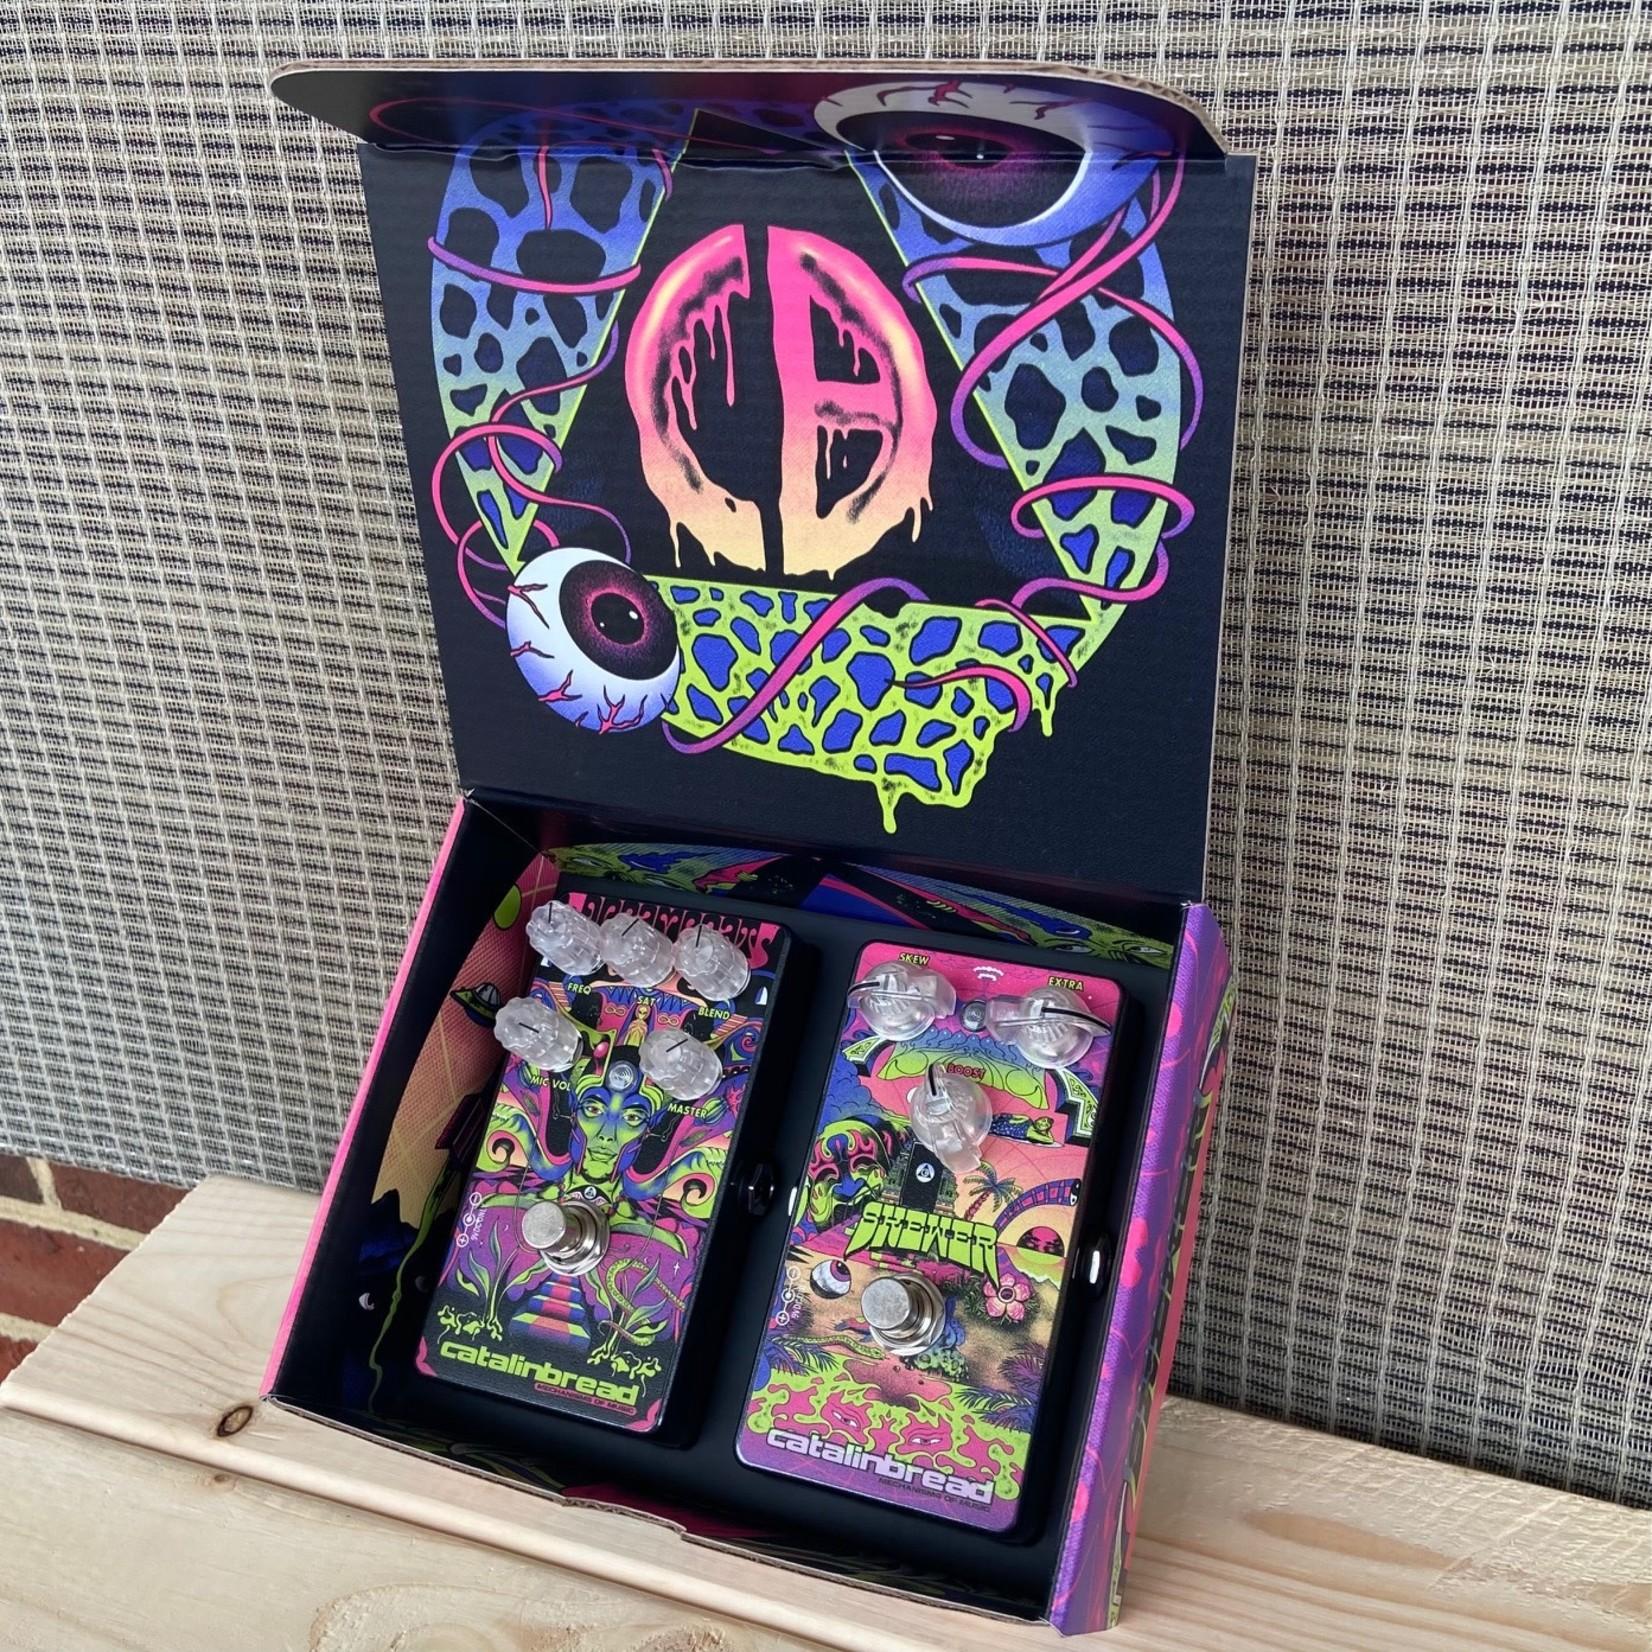 Catalinbread Catalinbread Dreamcoat/Skewer Box Set Limited Edition